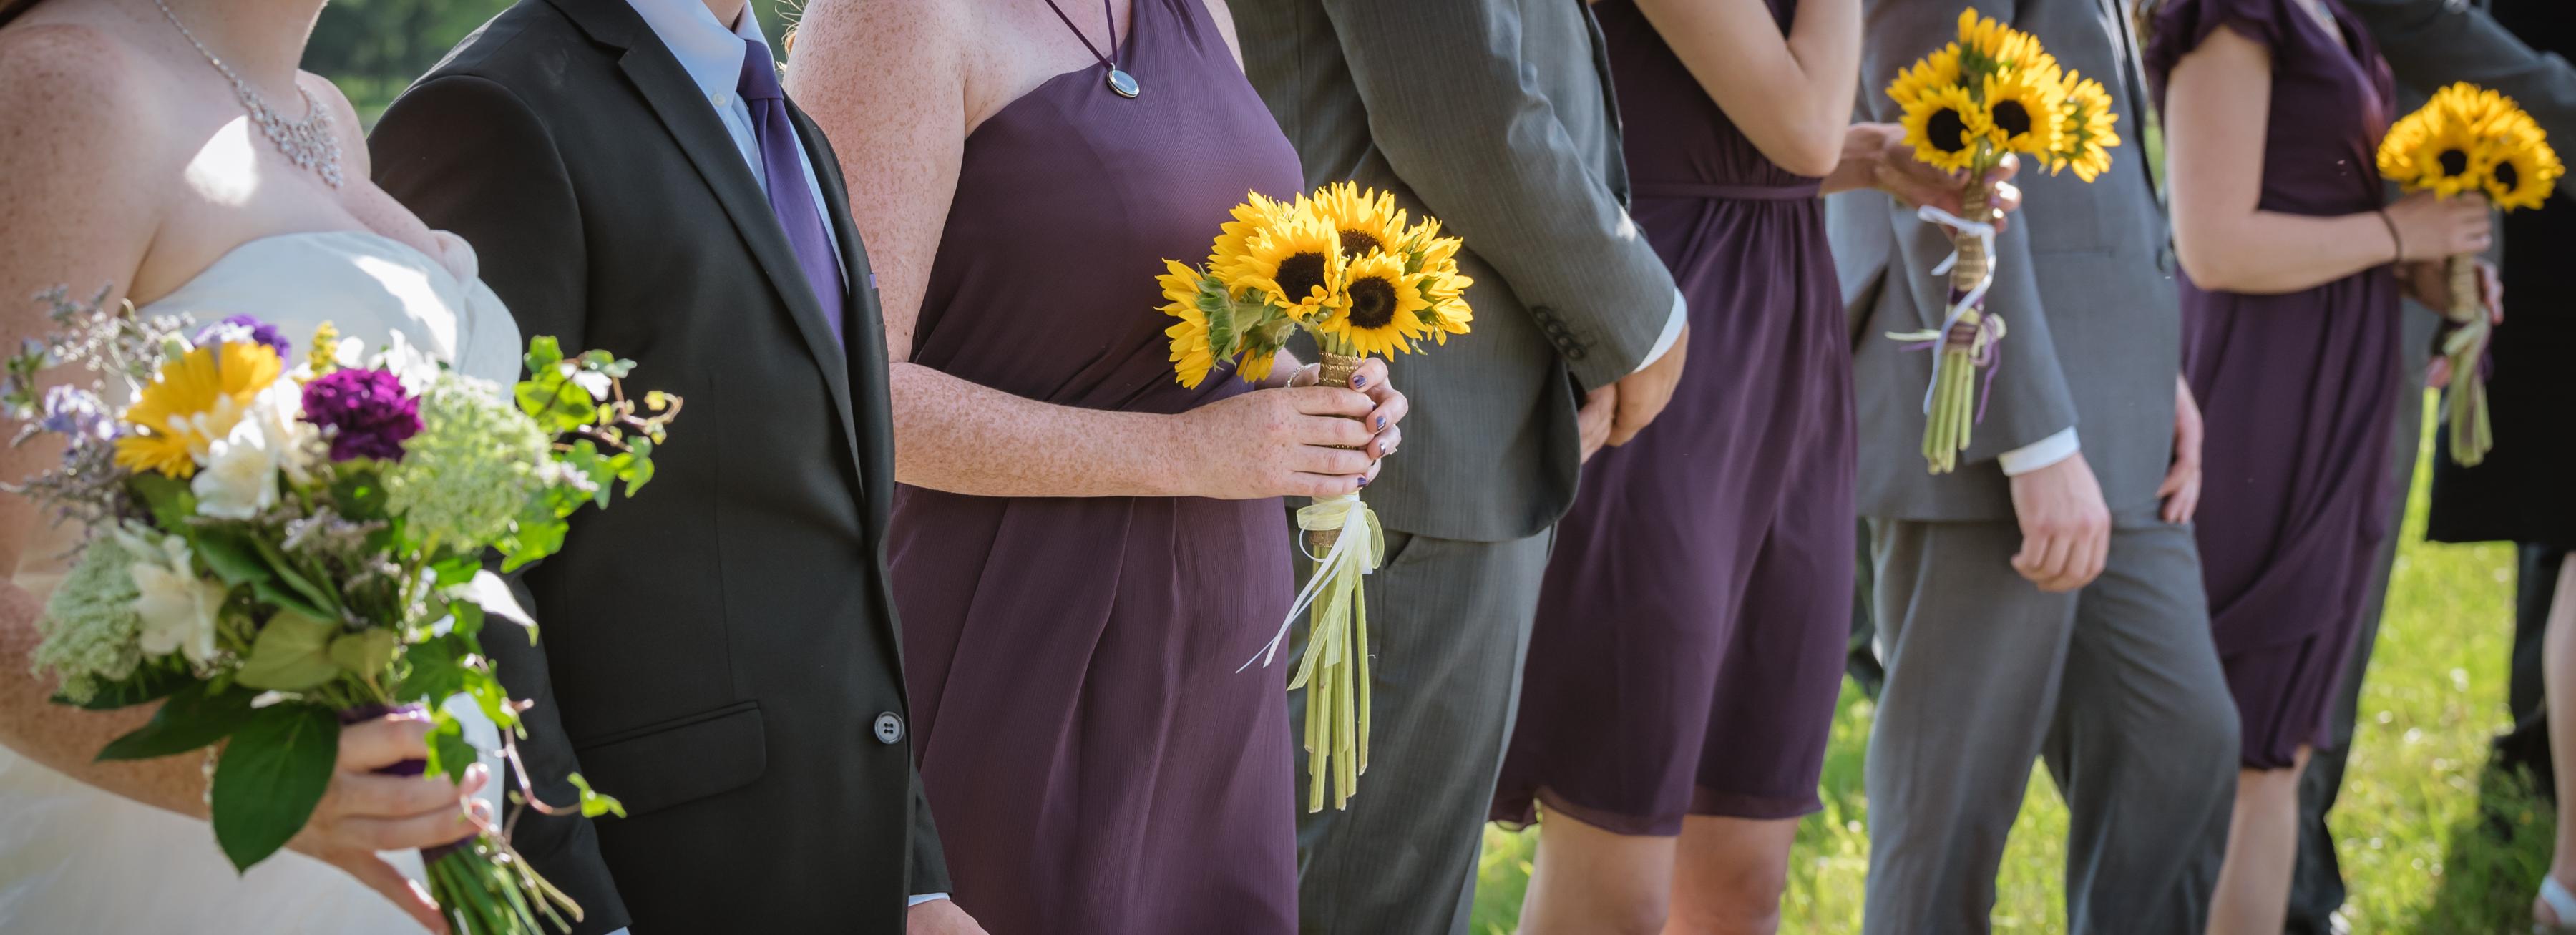 PP_Wedding_Details_2016_043